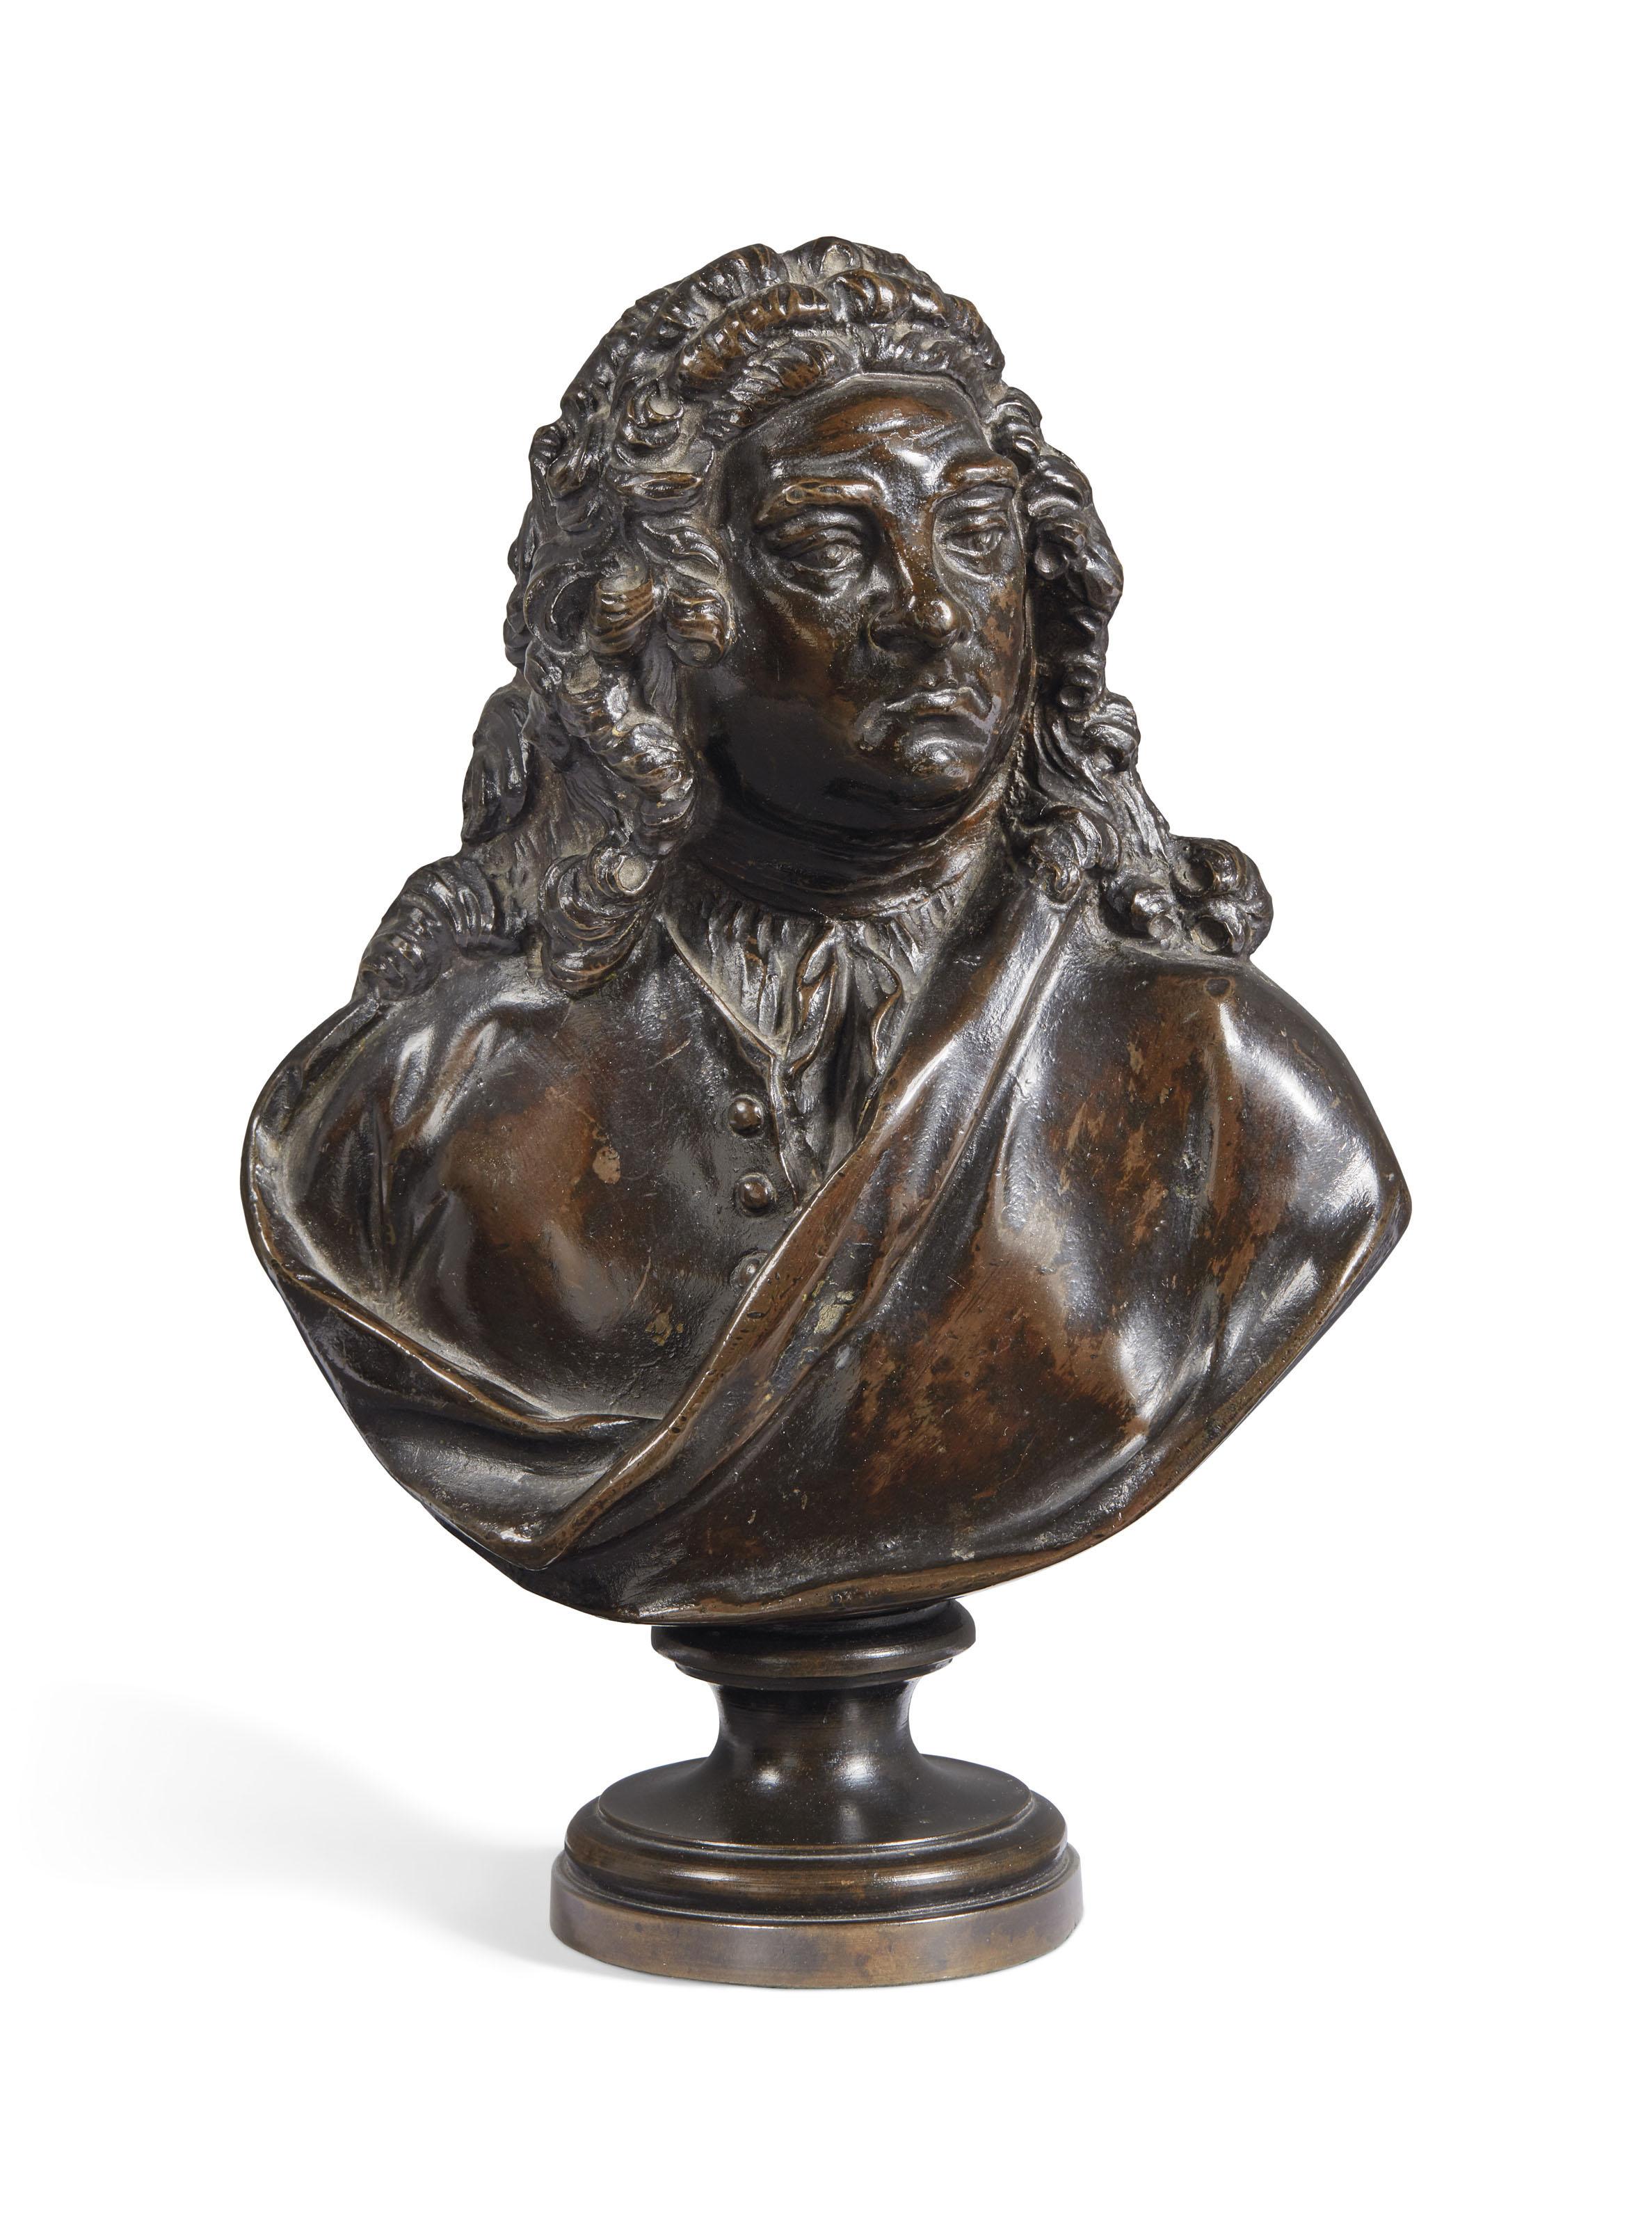 BUSTE EN BRONZE REPRESENTANT GEORGES FREDERICK HAENDEL (1685-1759)